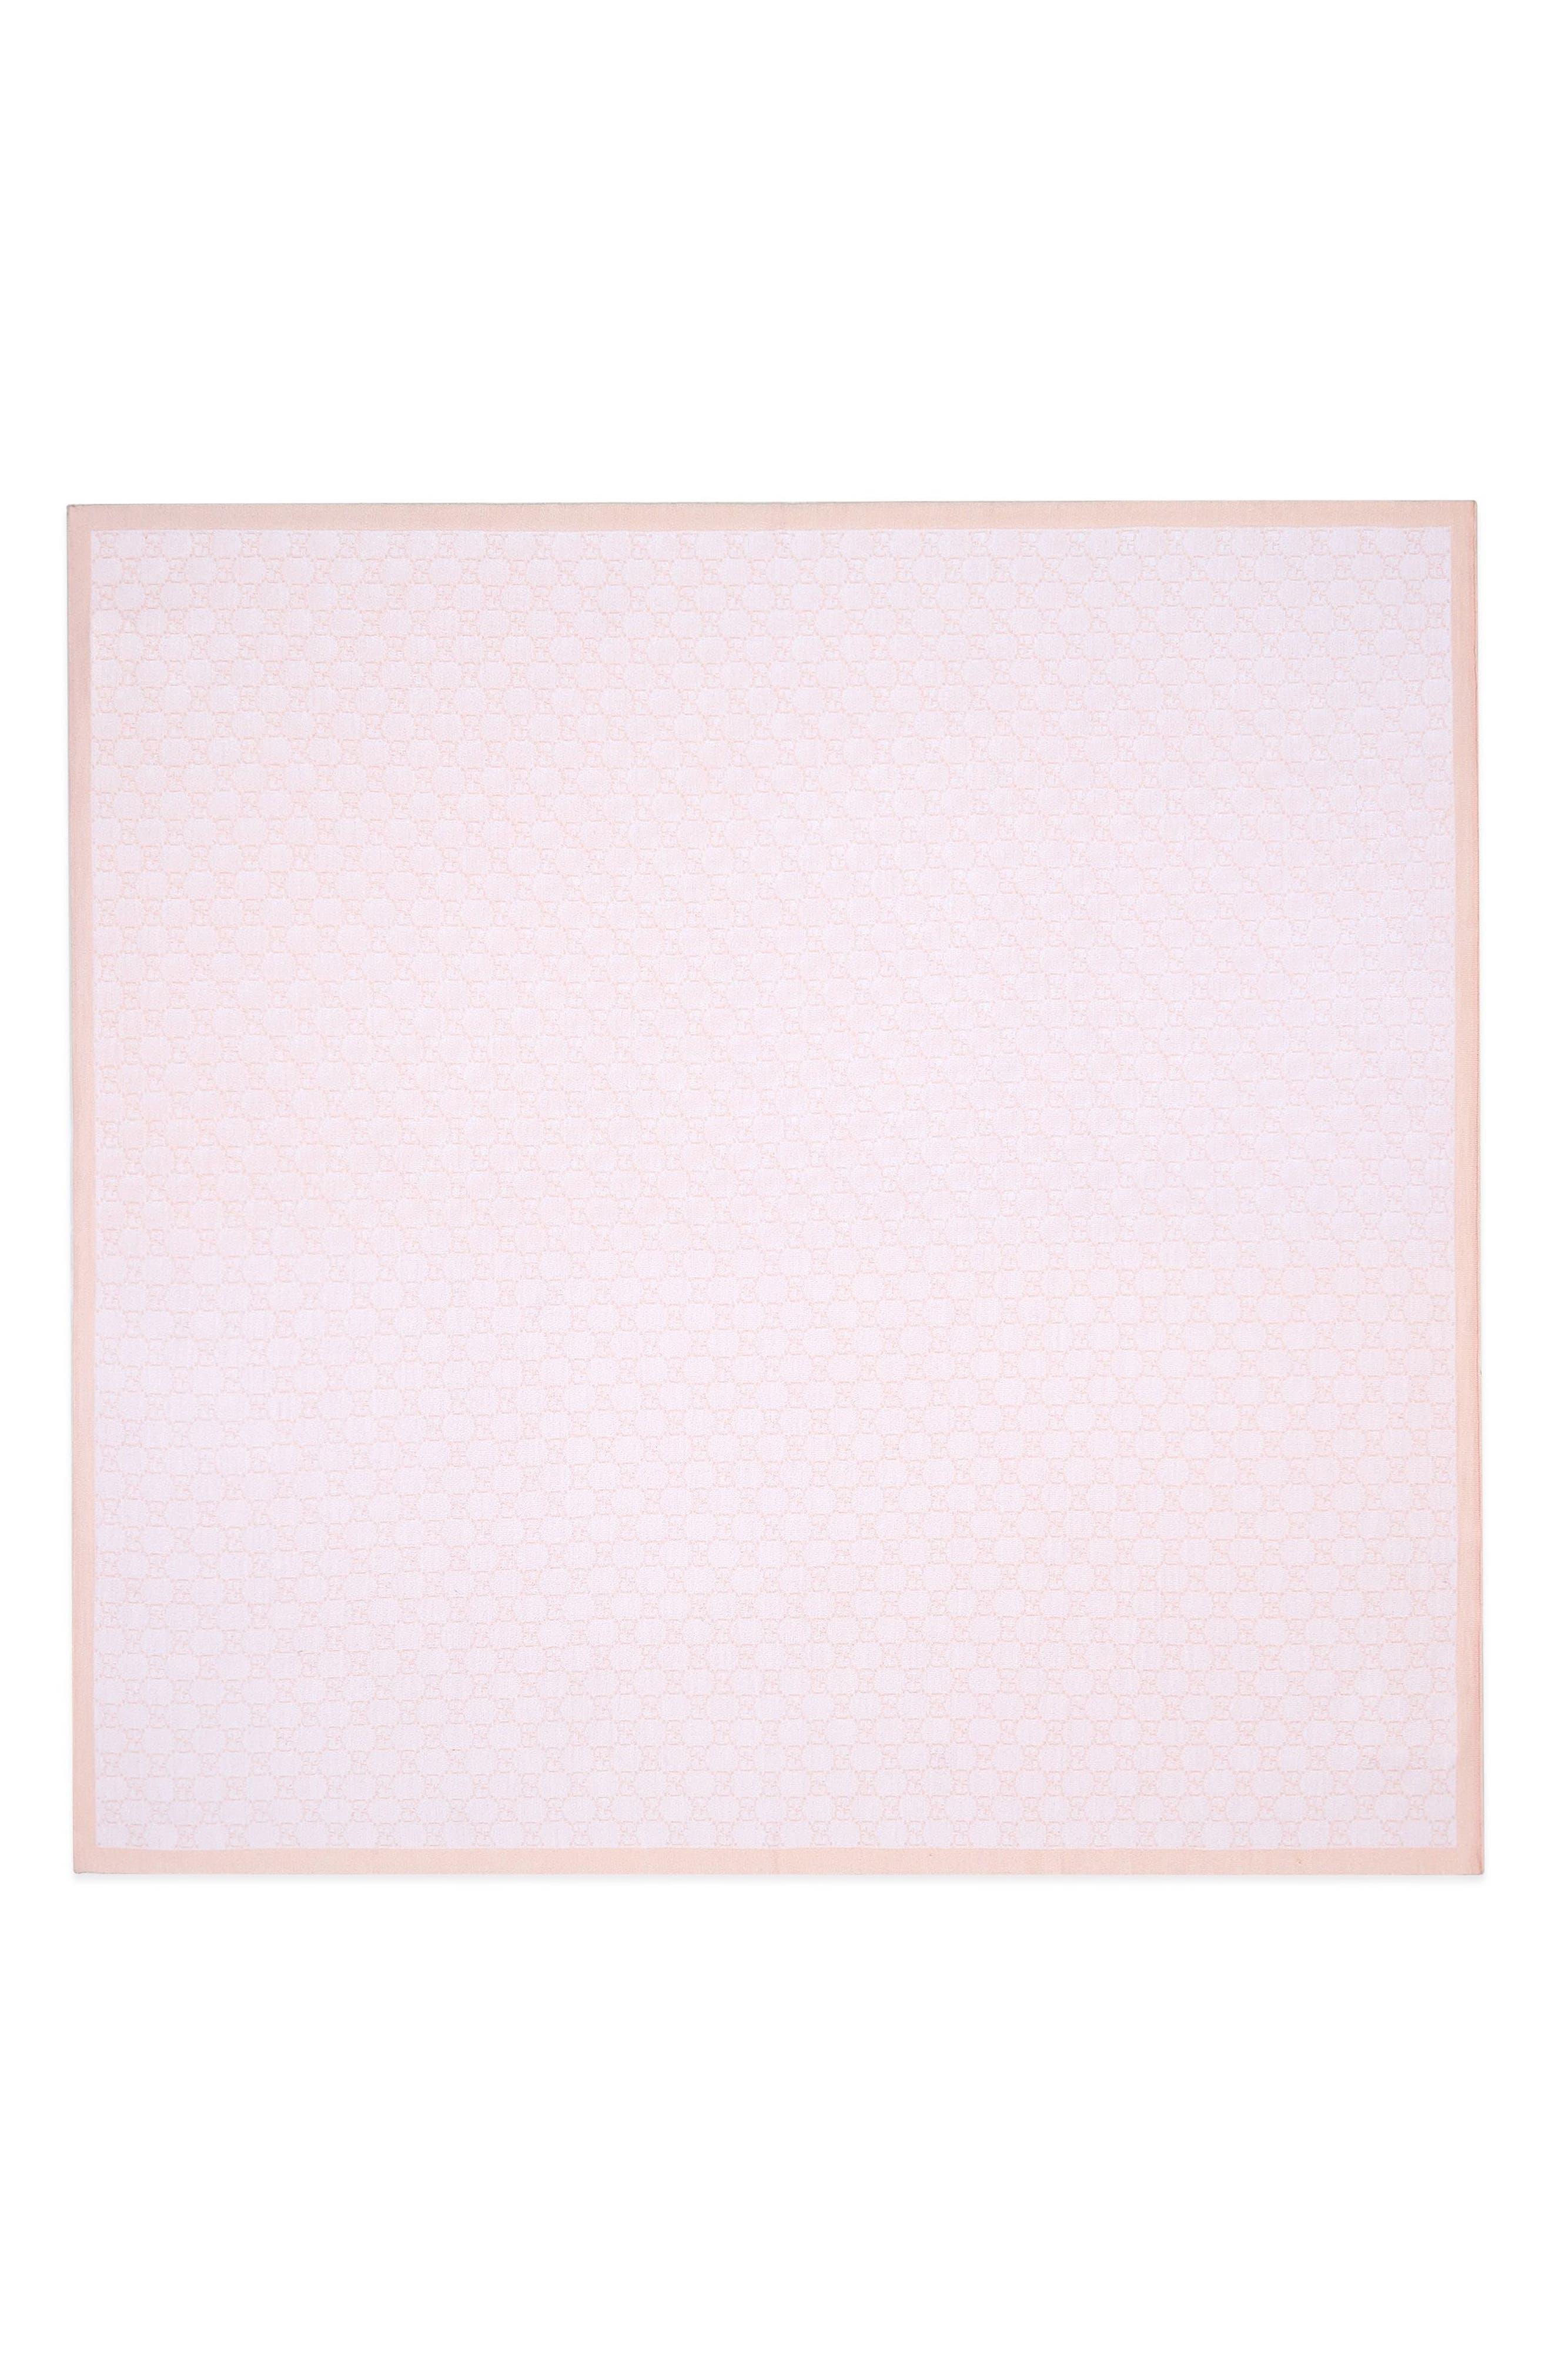 Interlock Logo Pattern Blanket,                         Main,                         color, IVORY/ PINK